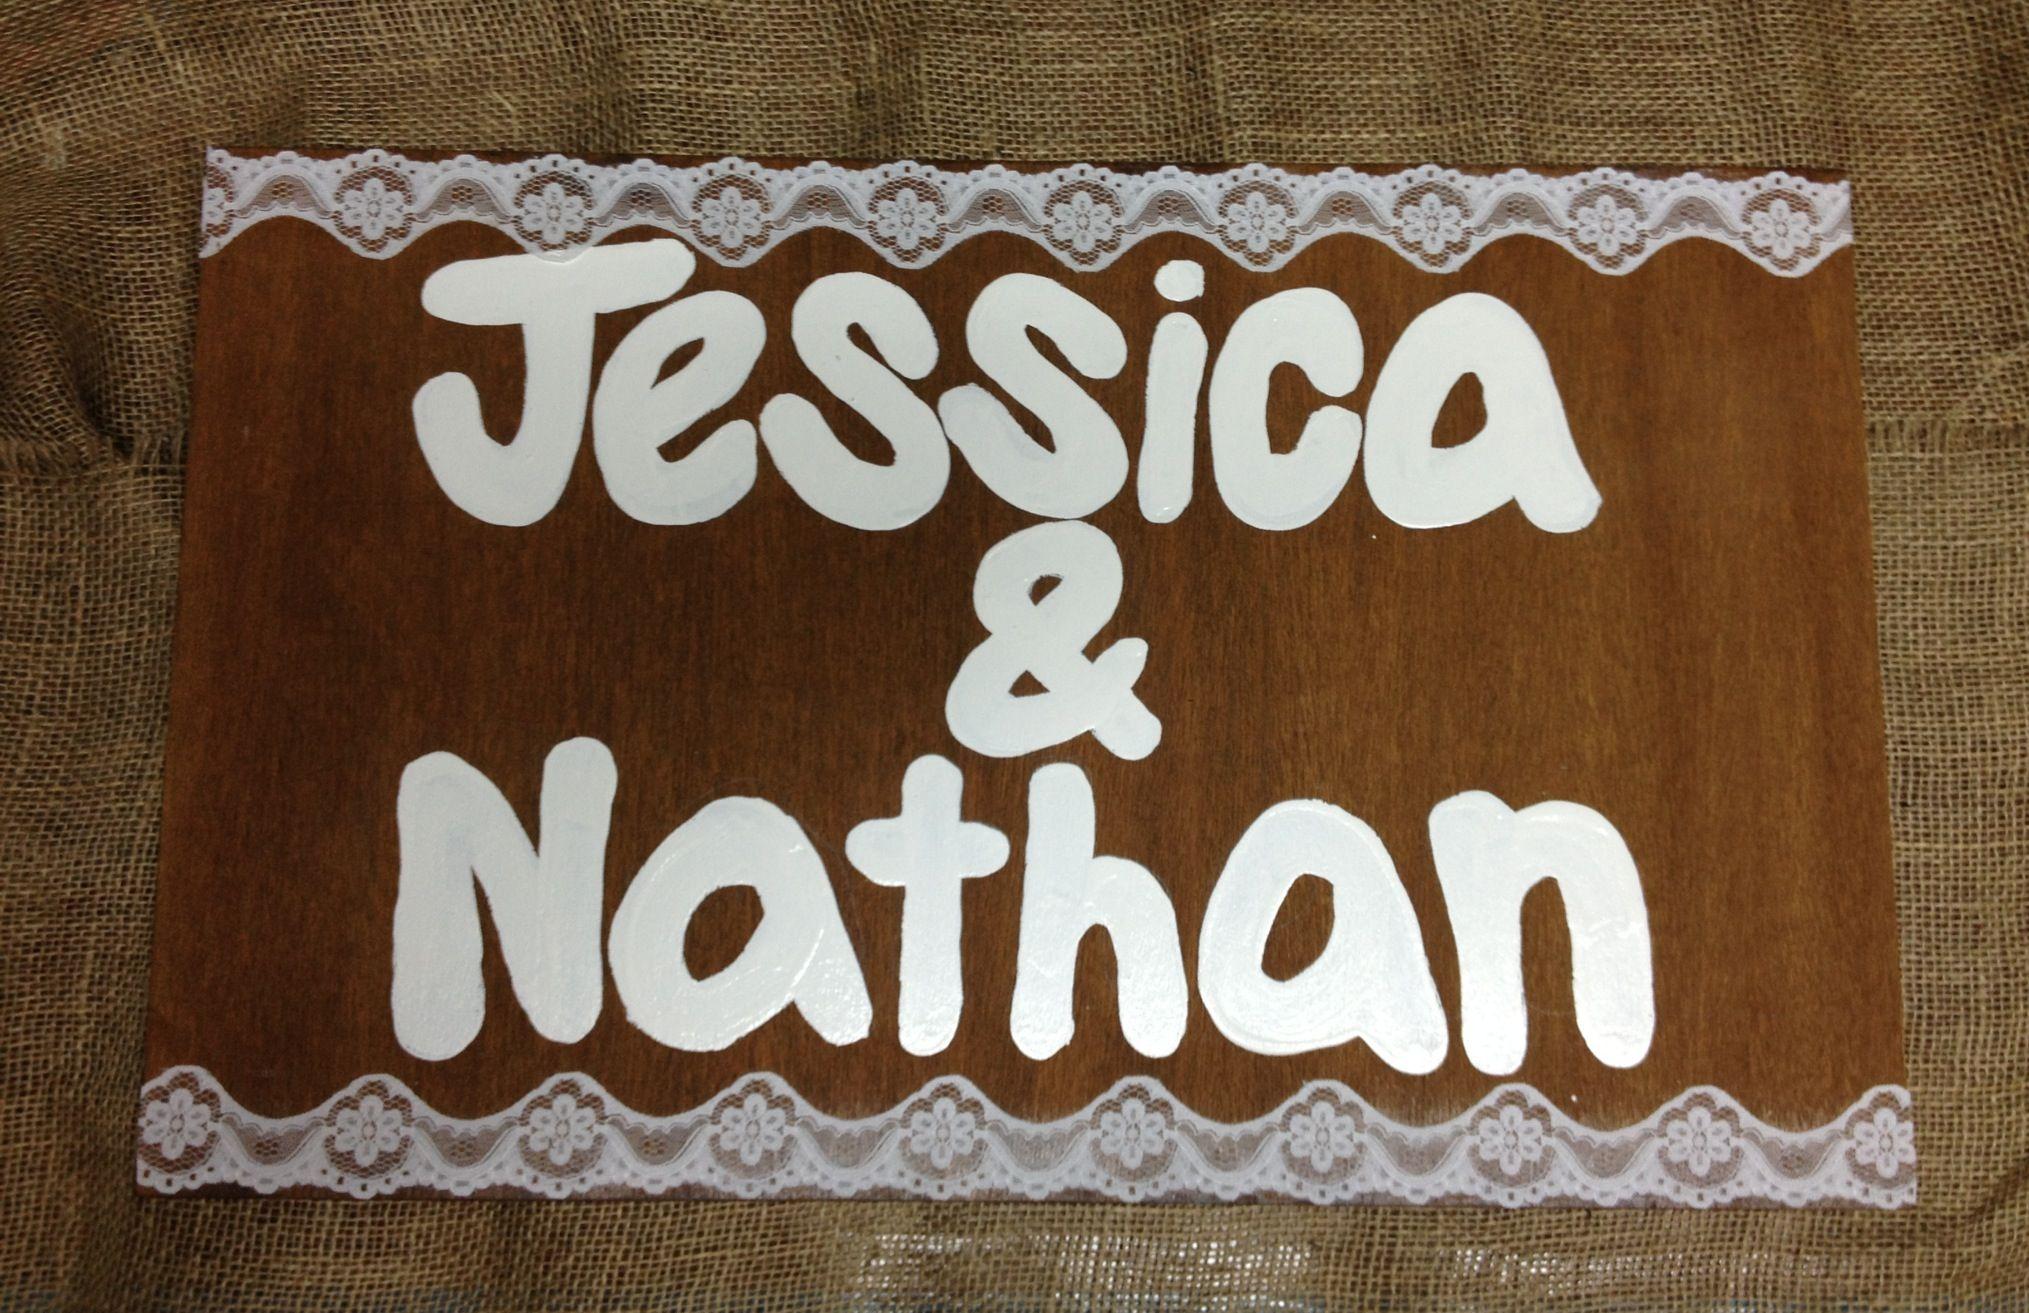 Personalised wedding signs $25